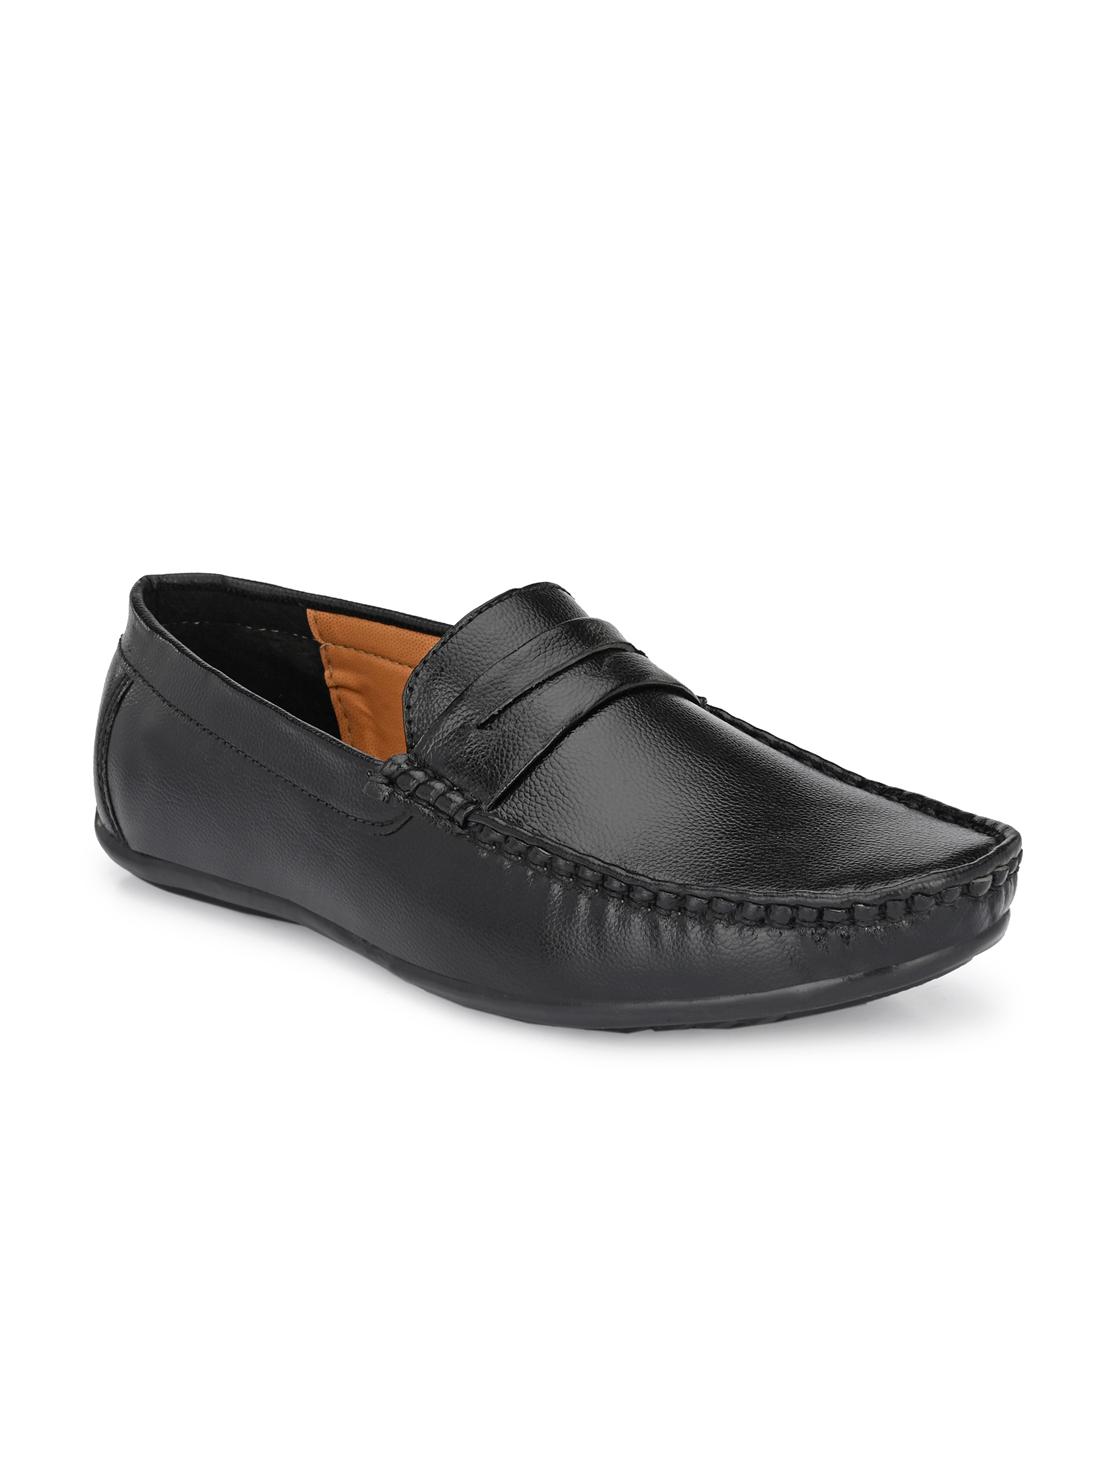 Guava | Guava Men's Casual loafer Shoe - Black